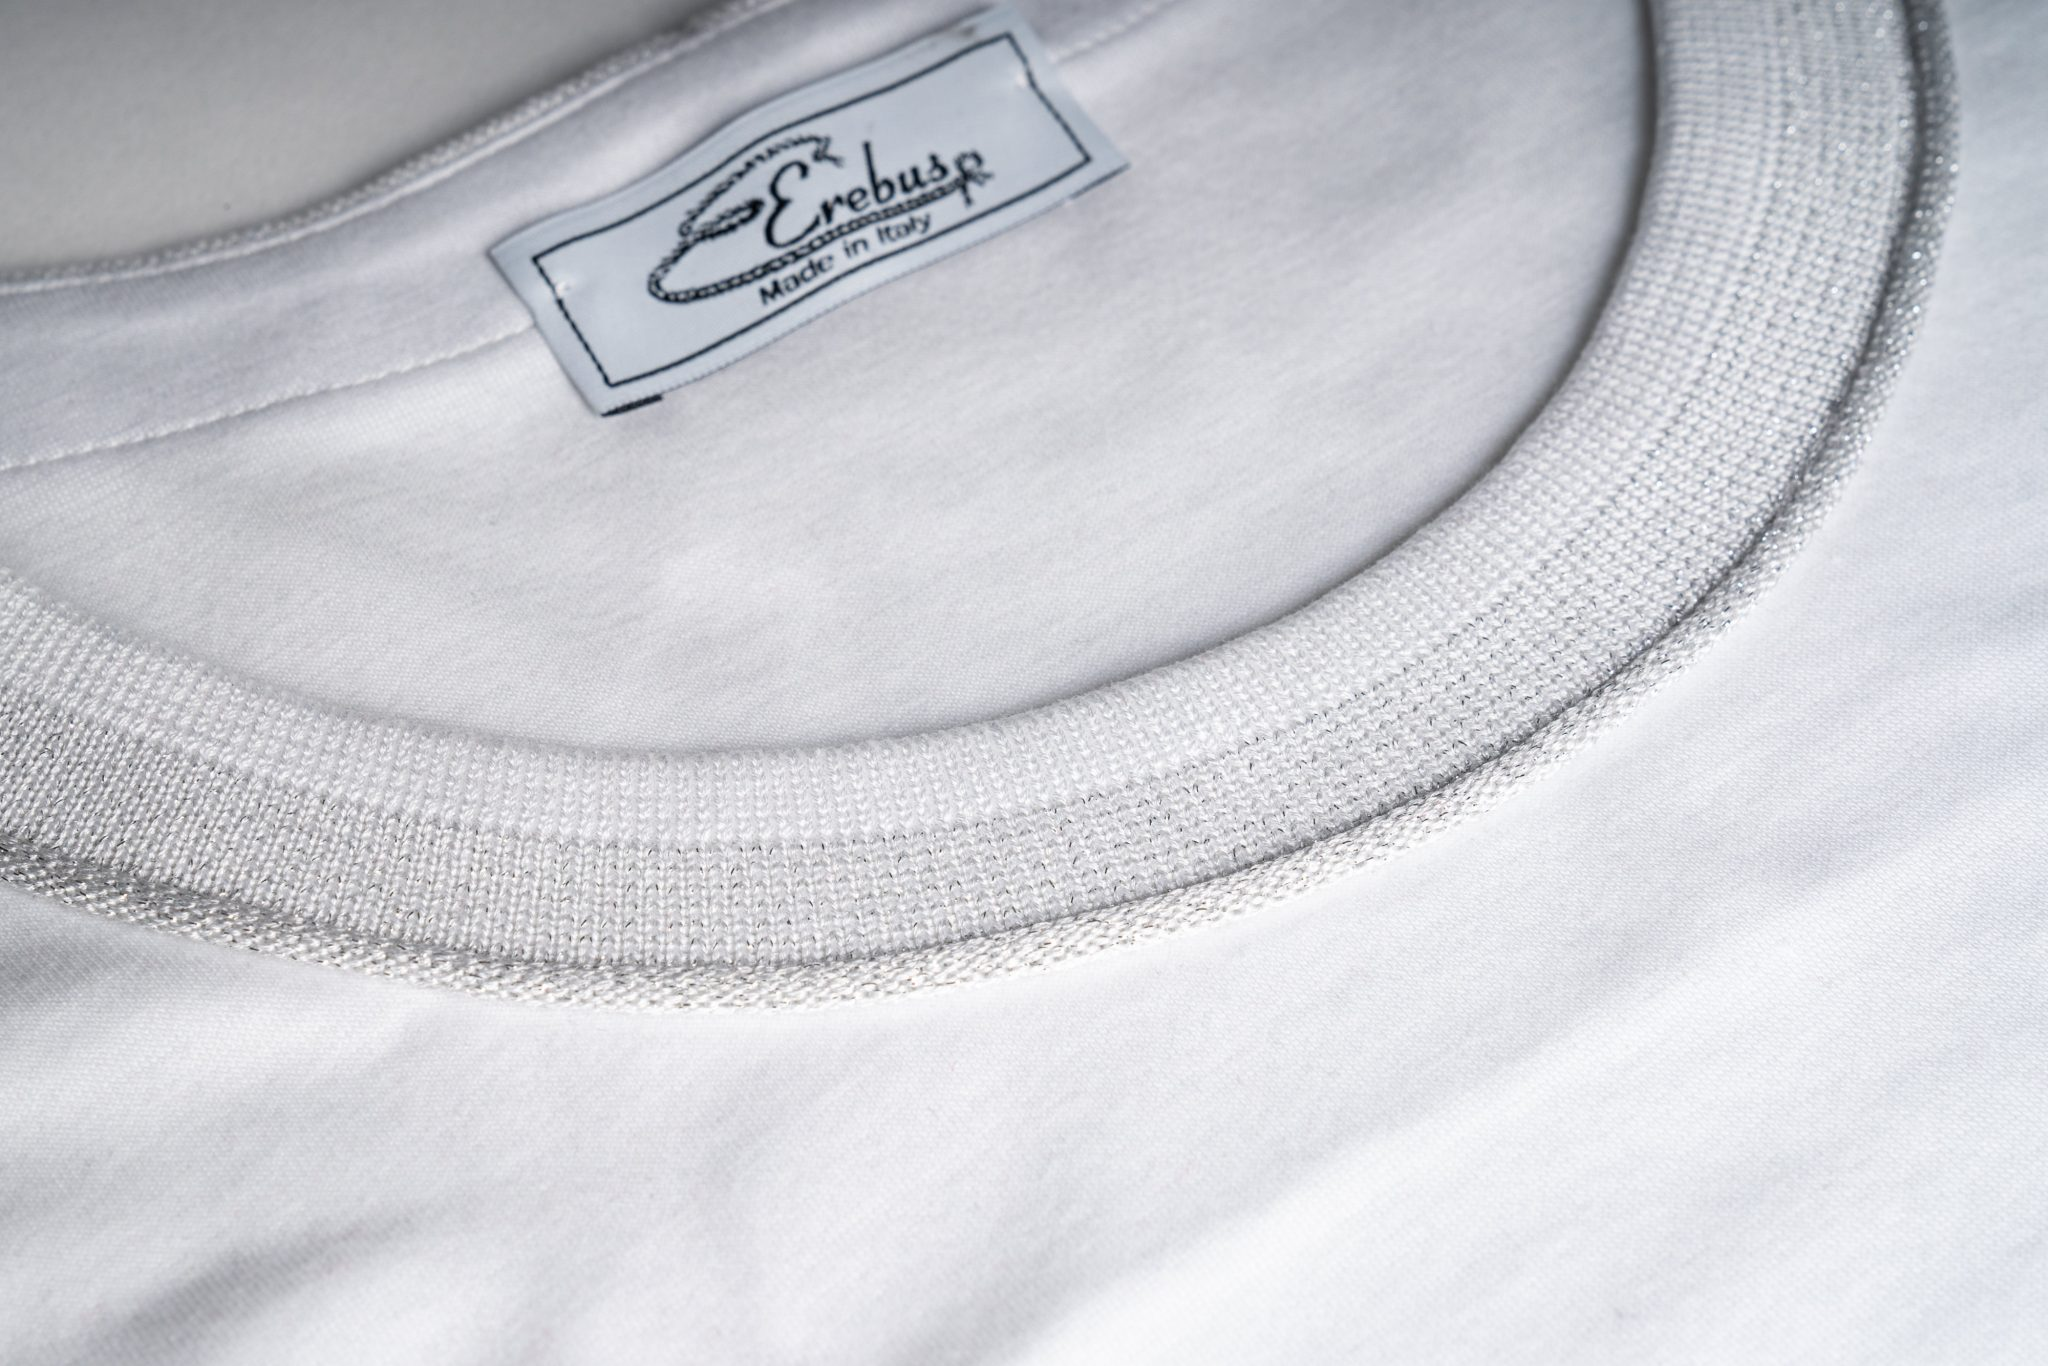 Scollo jaquard tshirt bianca e argento